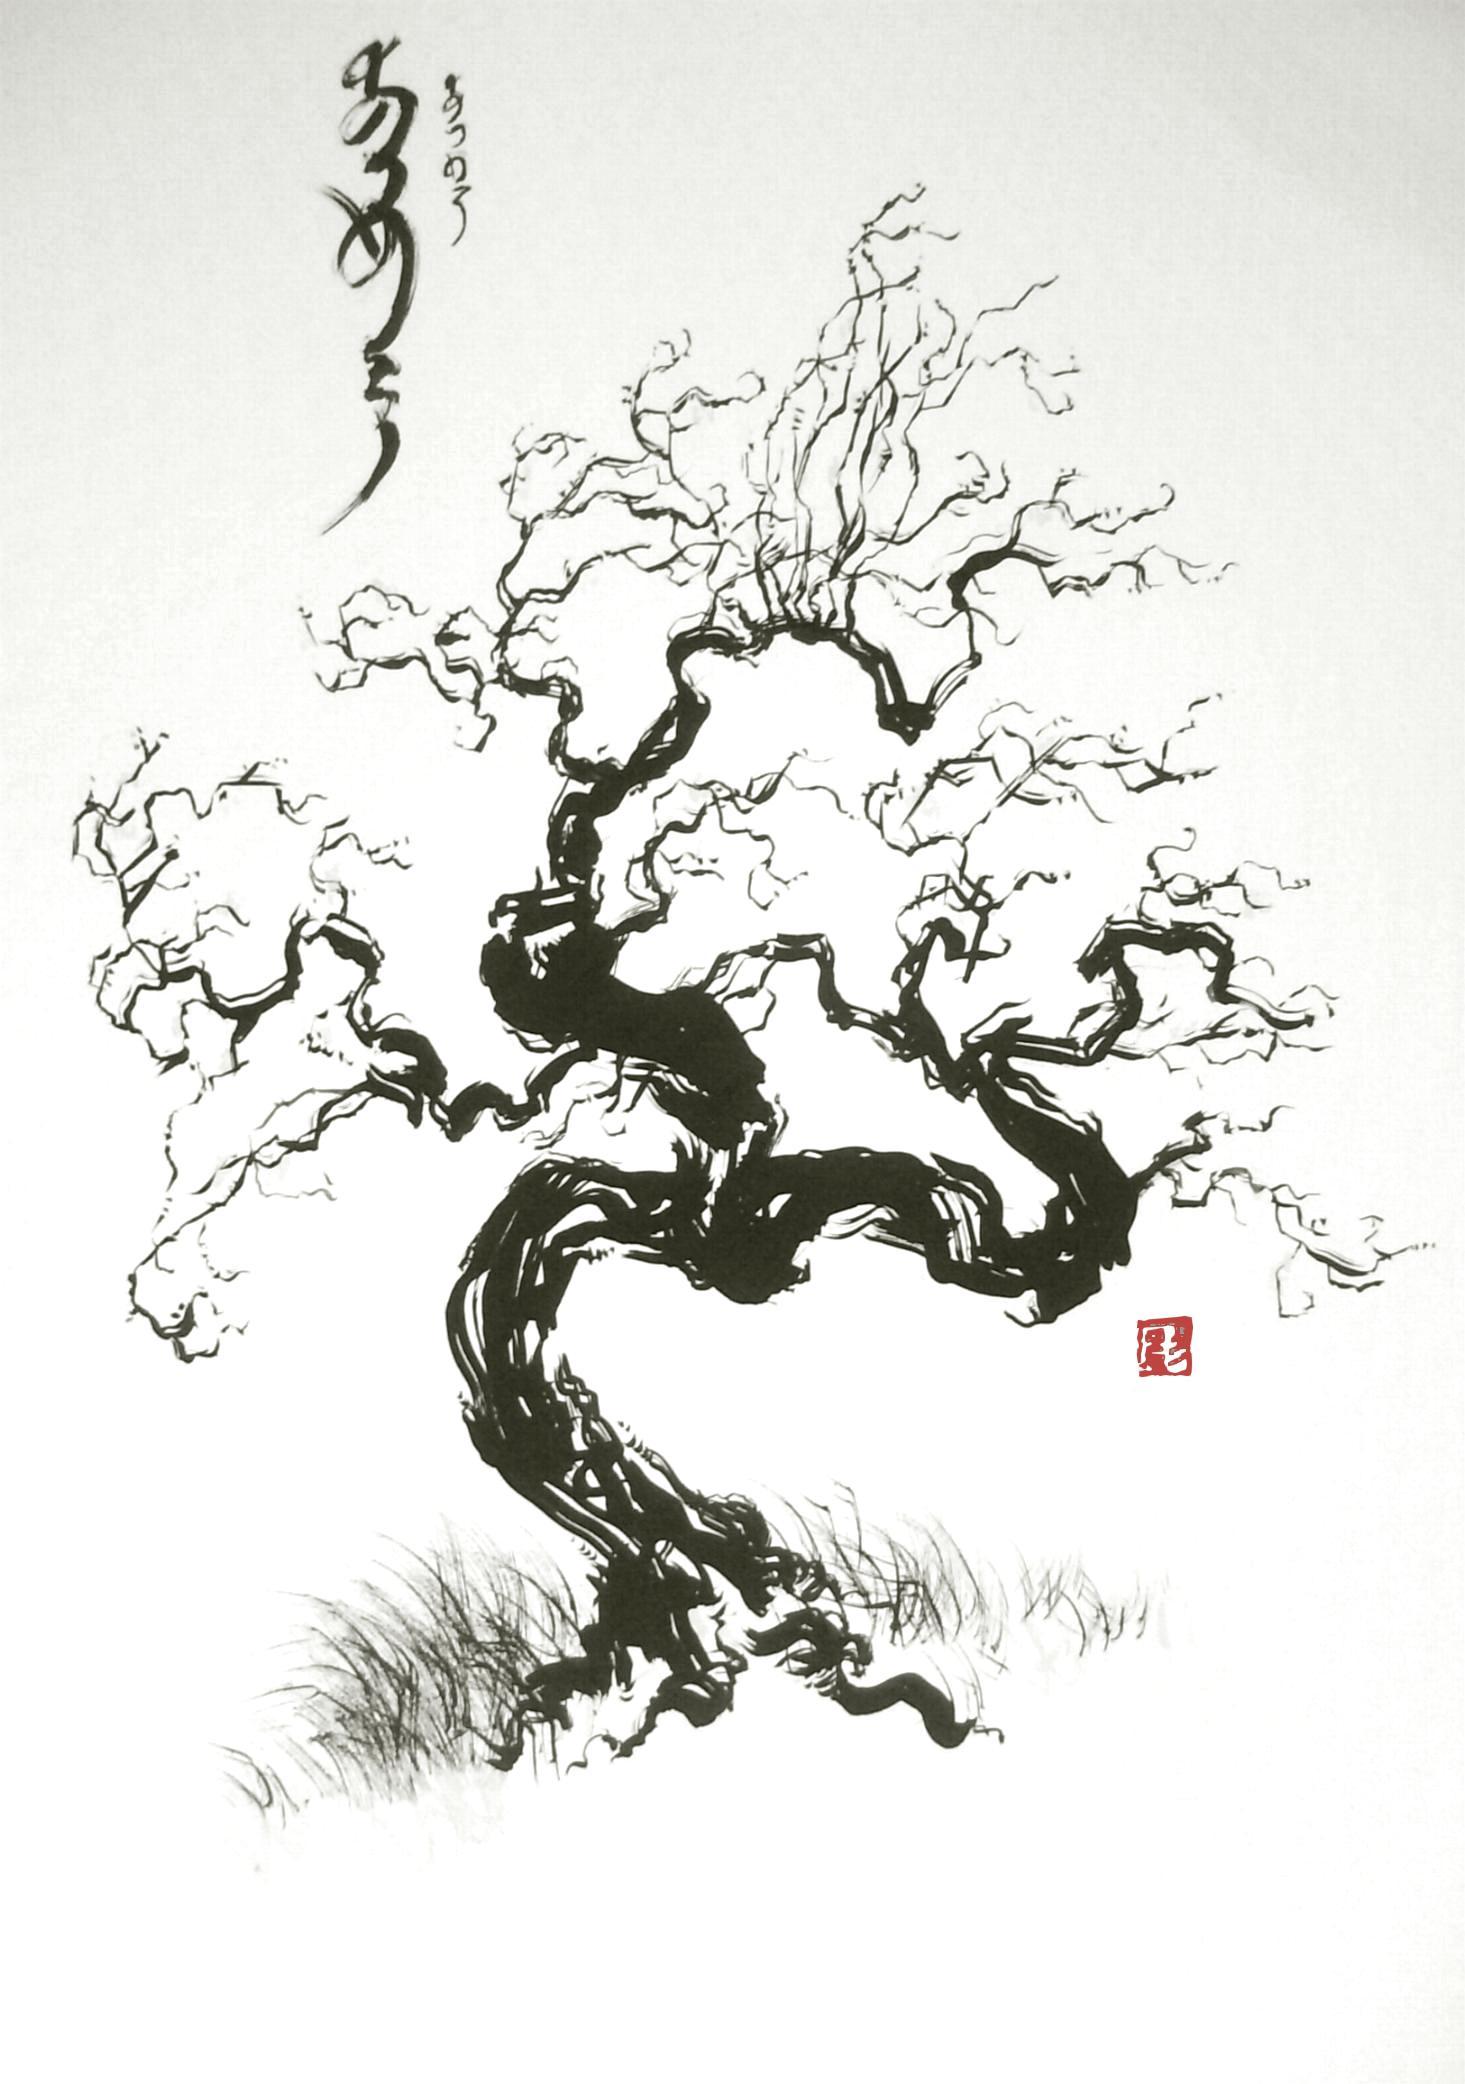 C novel dessins archive du blog arbre vent - Dessins arbre ...